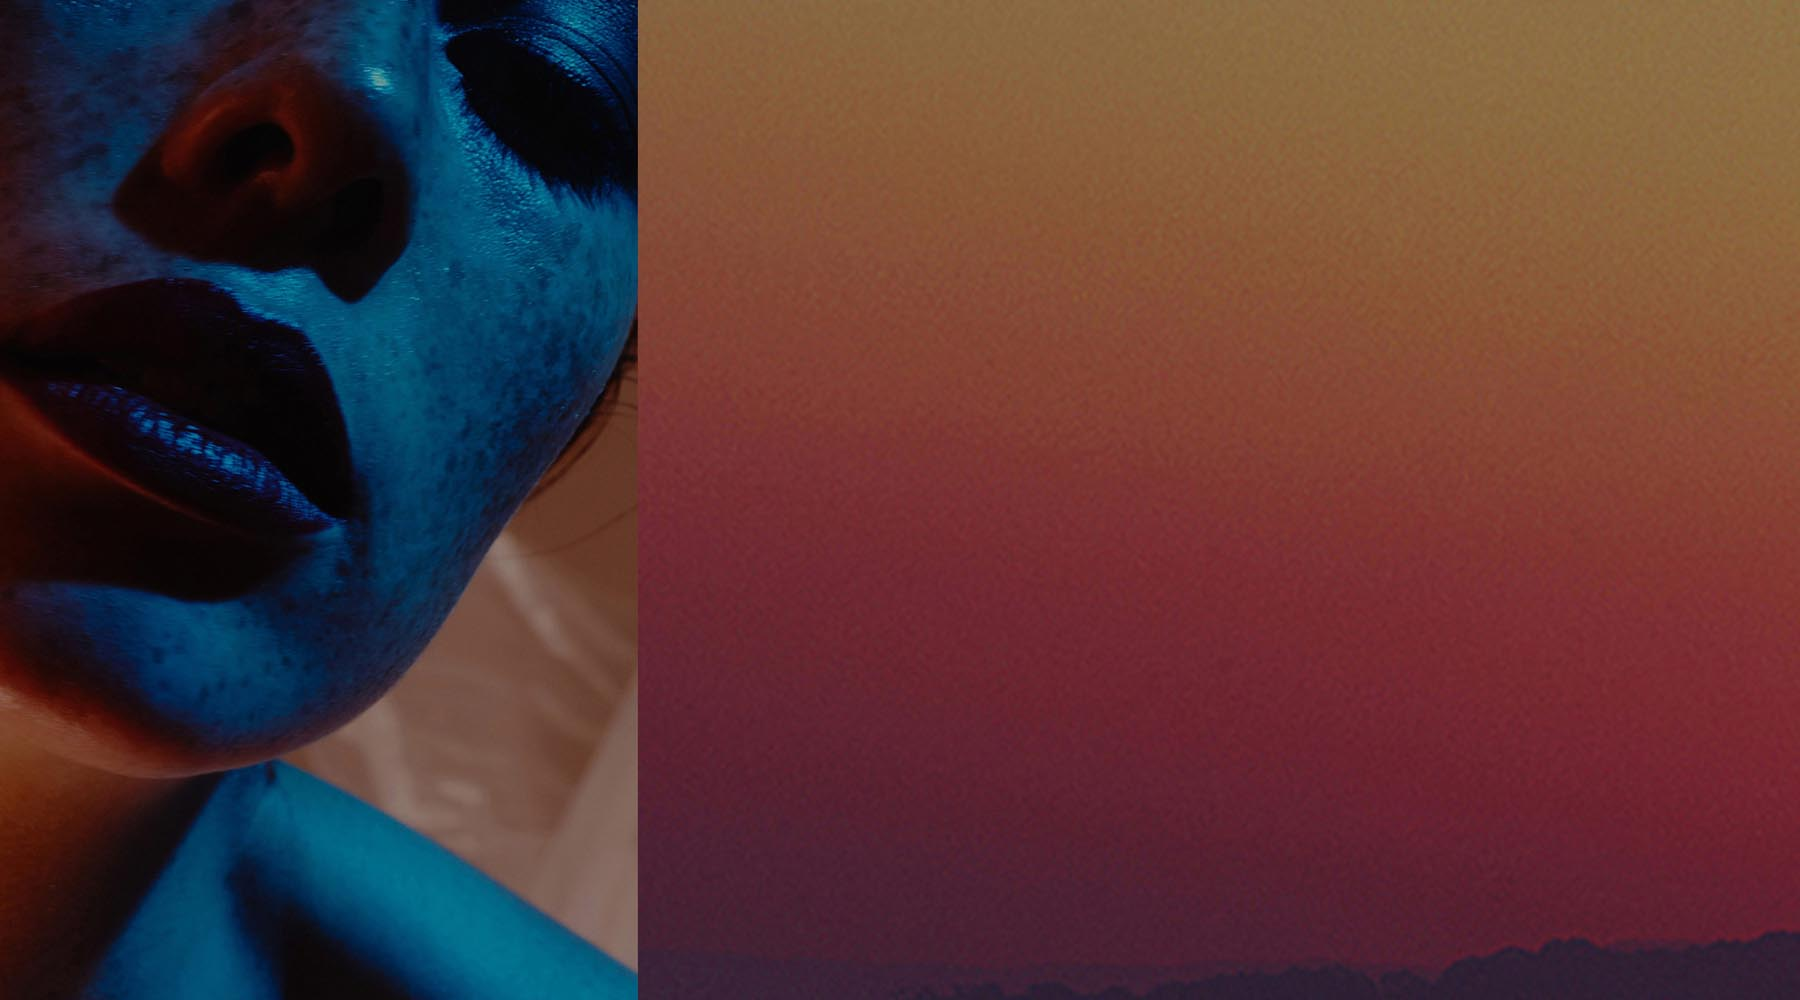 Noel McLaughlin Portrait & Sunrise Close up